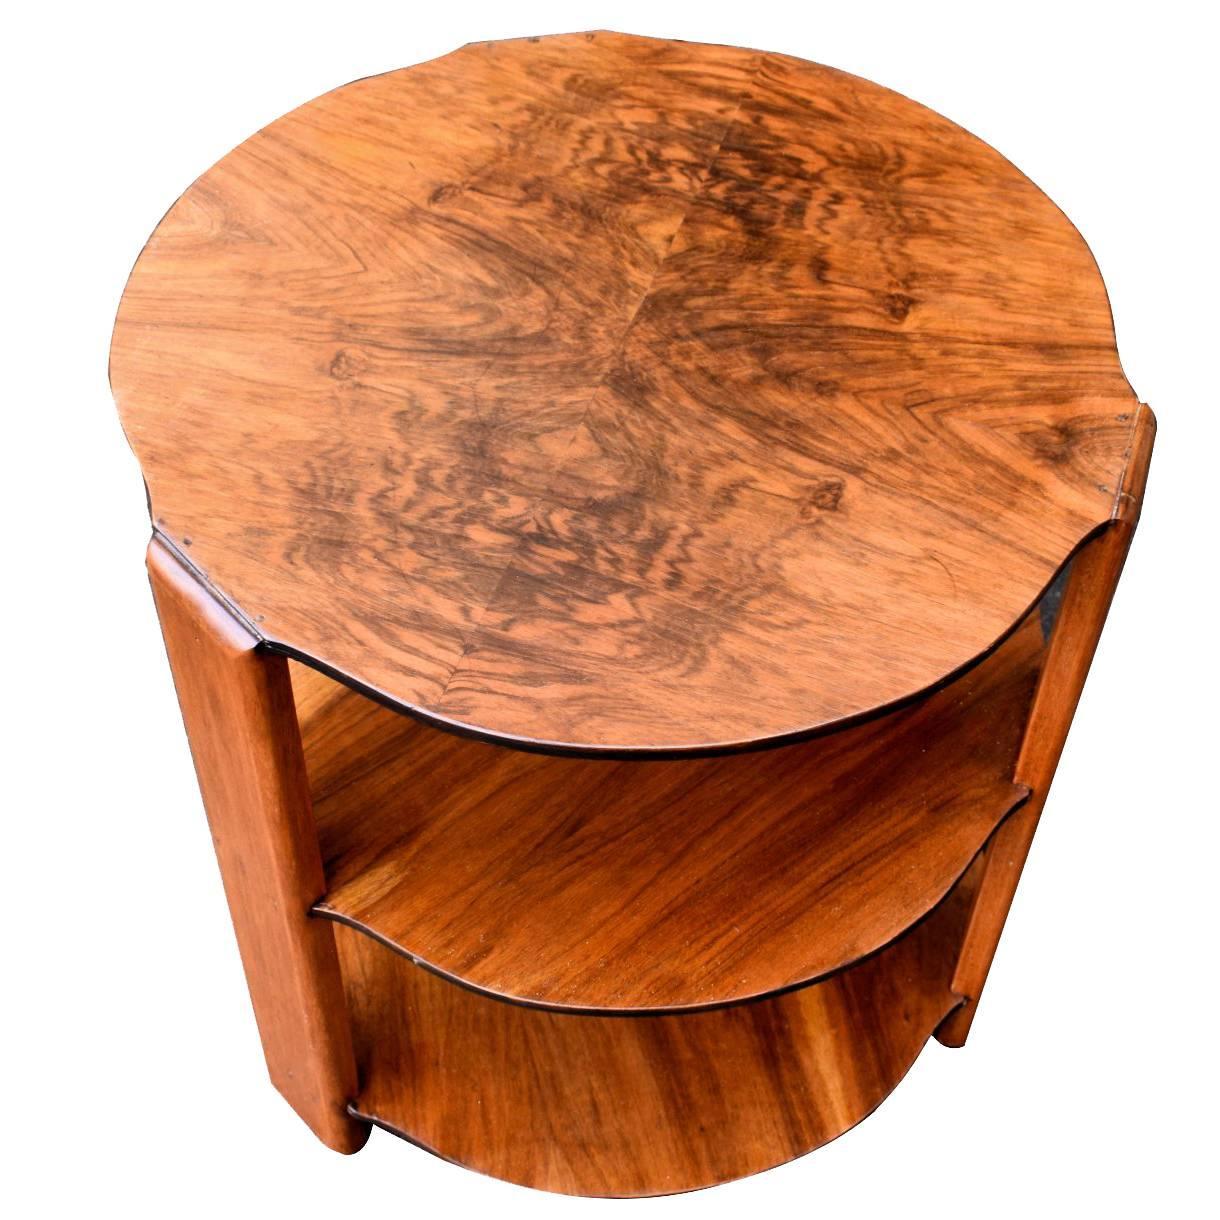 English 1930s Art Deco Tiered Walnut Coffee Table